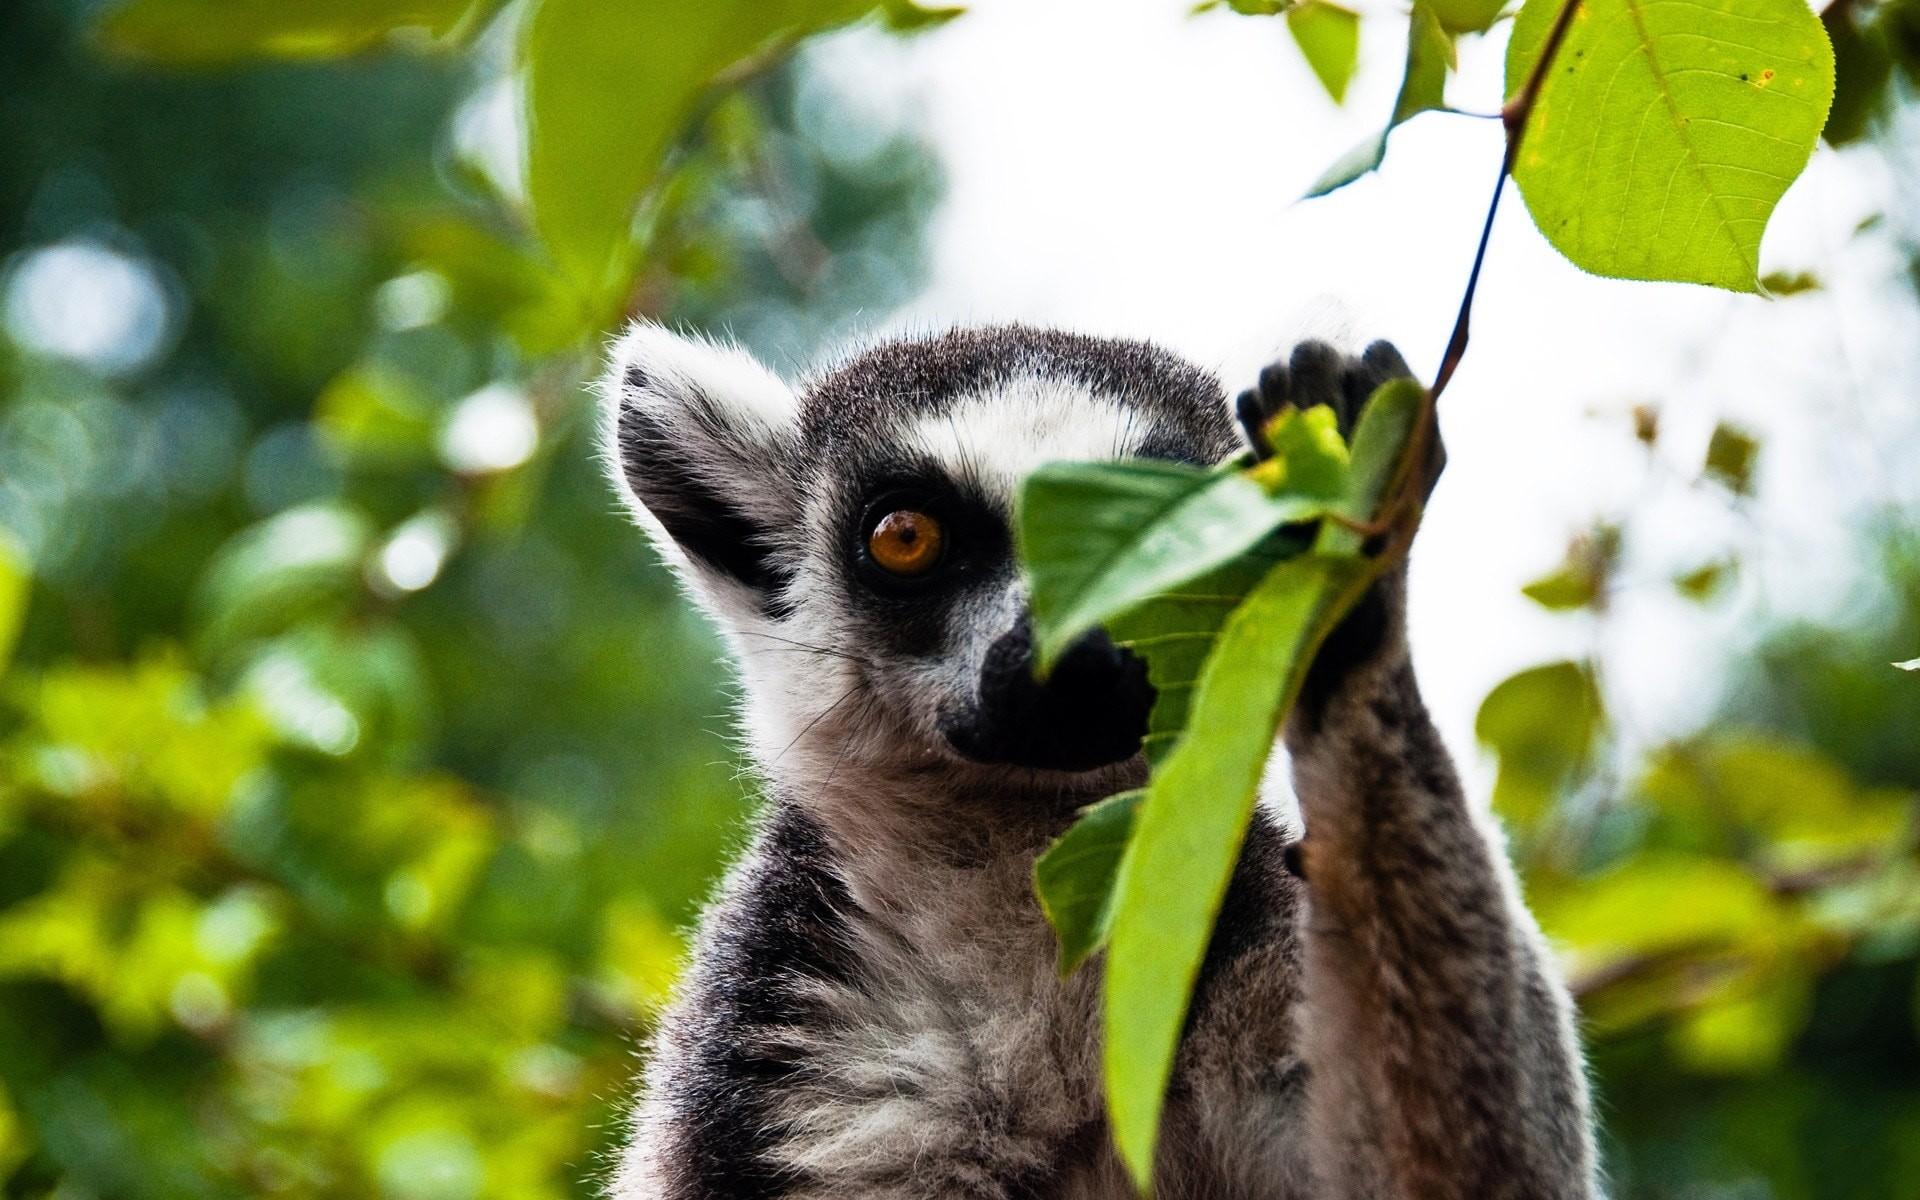 Res: 1920x1200, Lemur Wallpapers Lemur Wallpapers hd